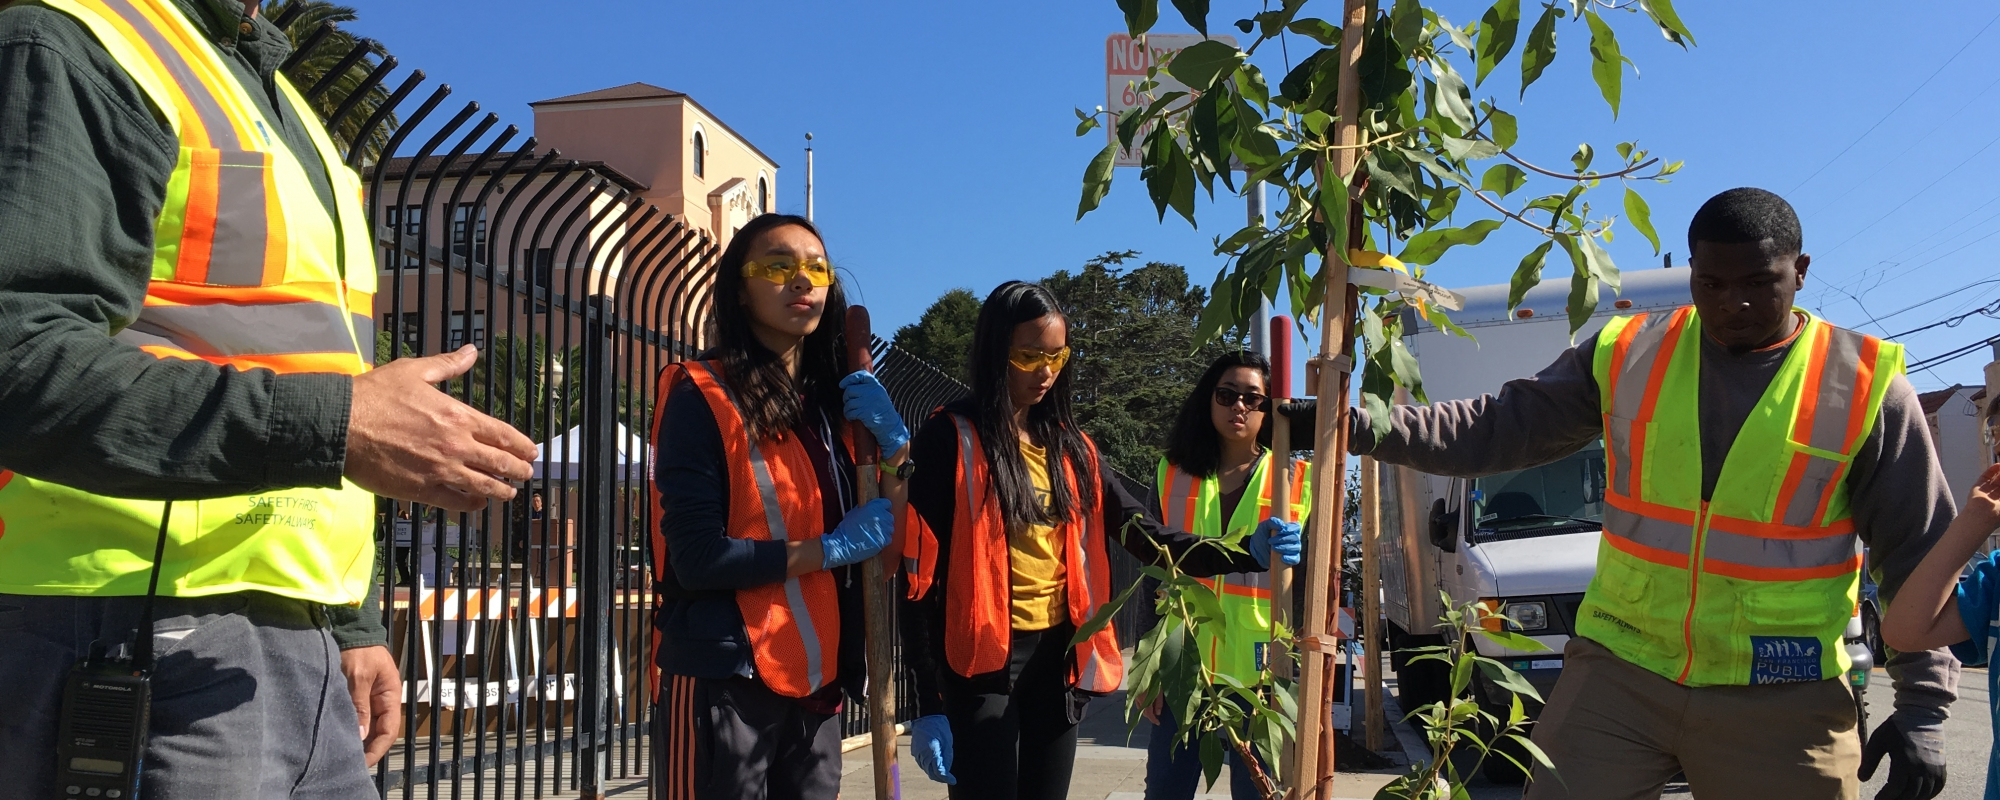 volunteers work with arborist to plant tree